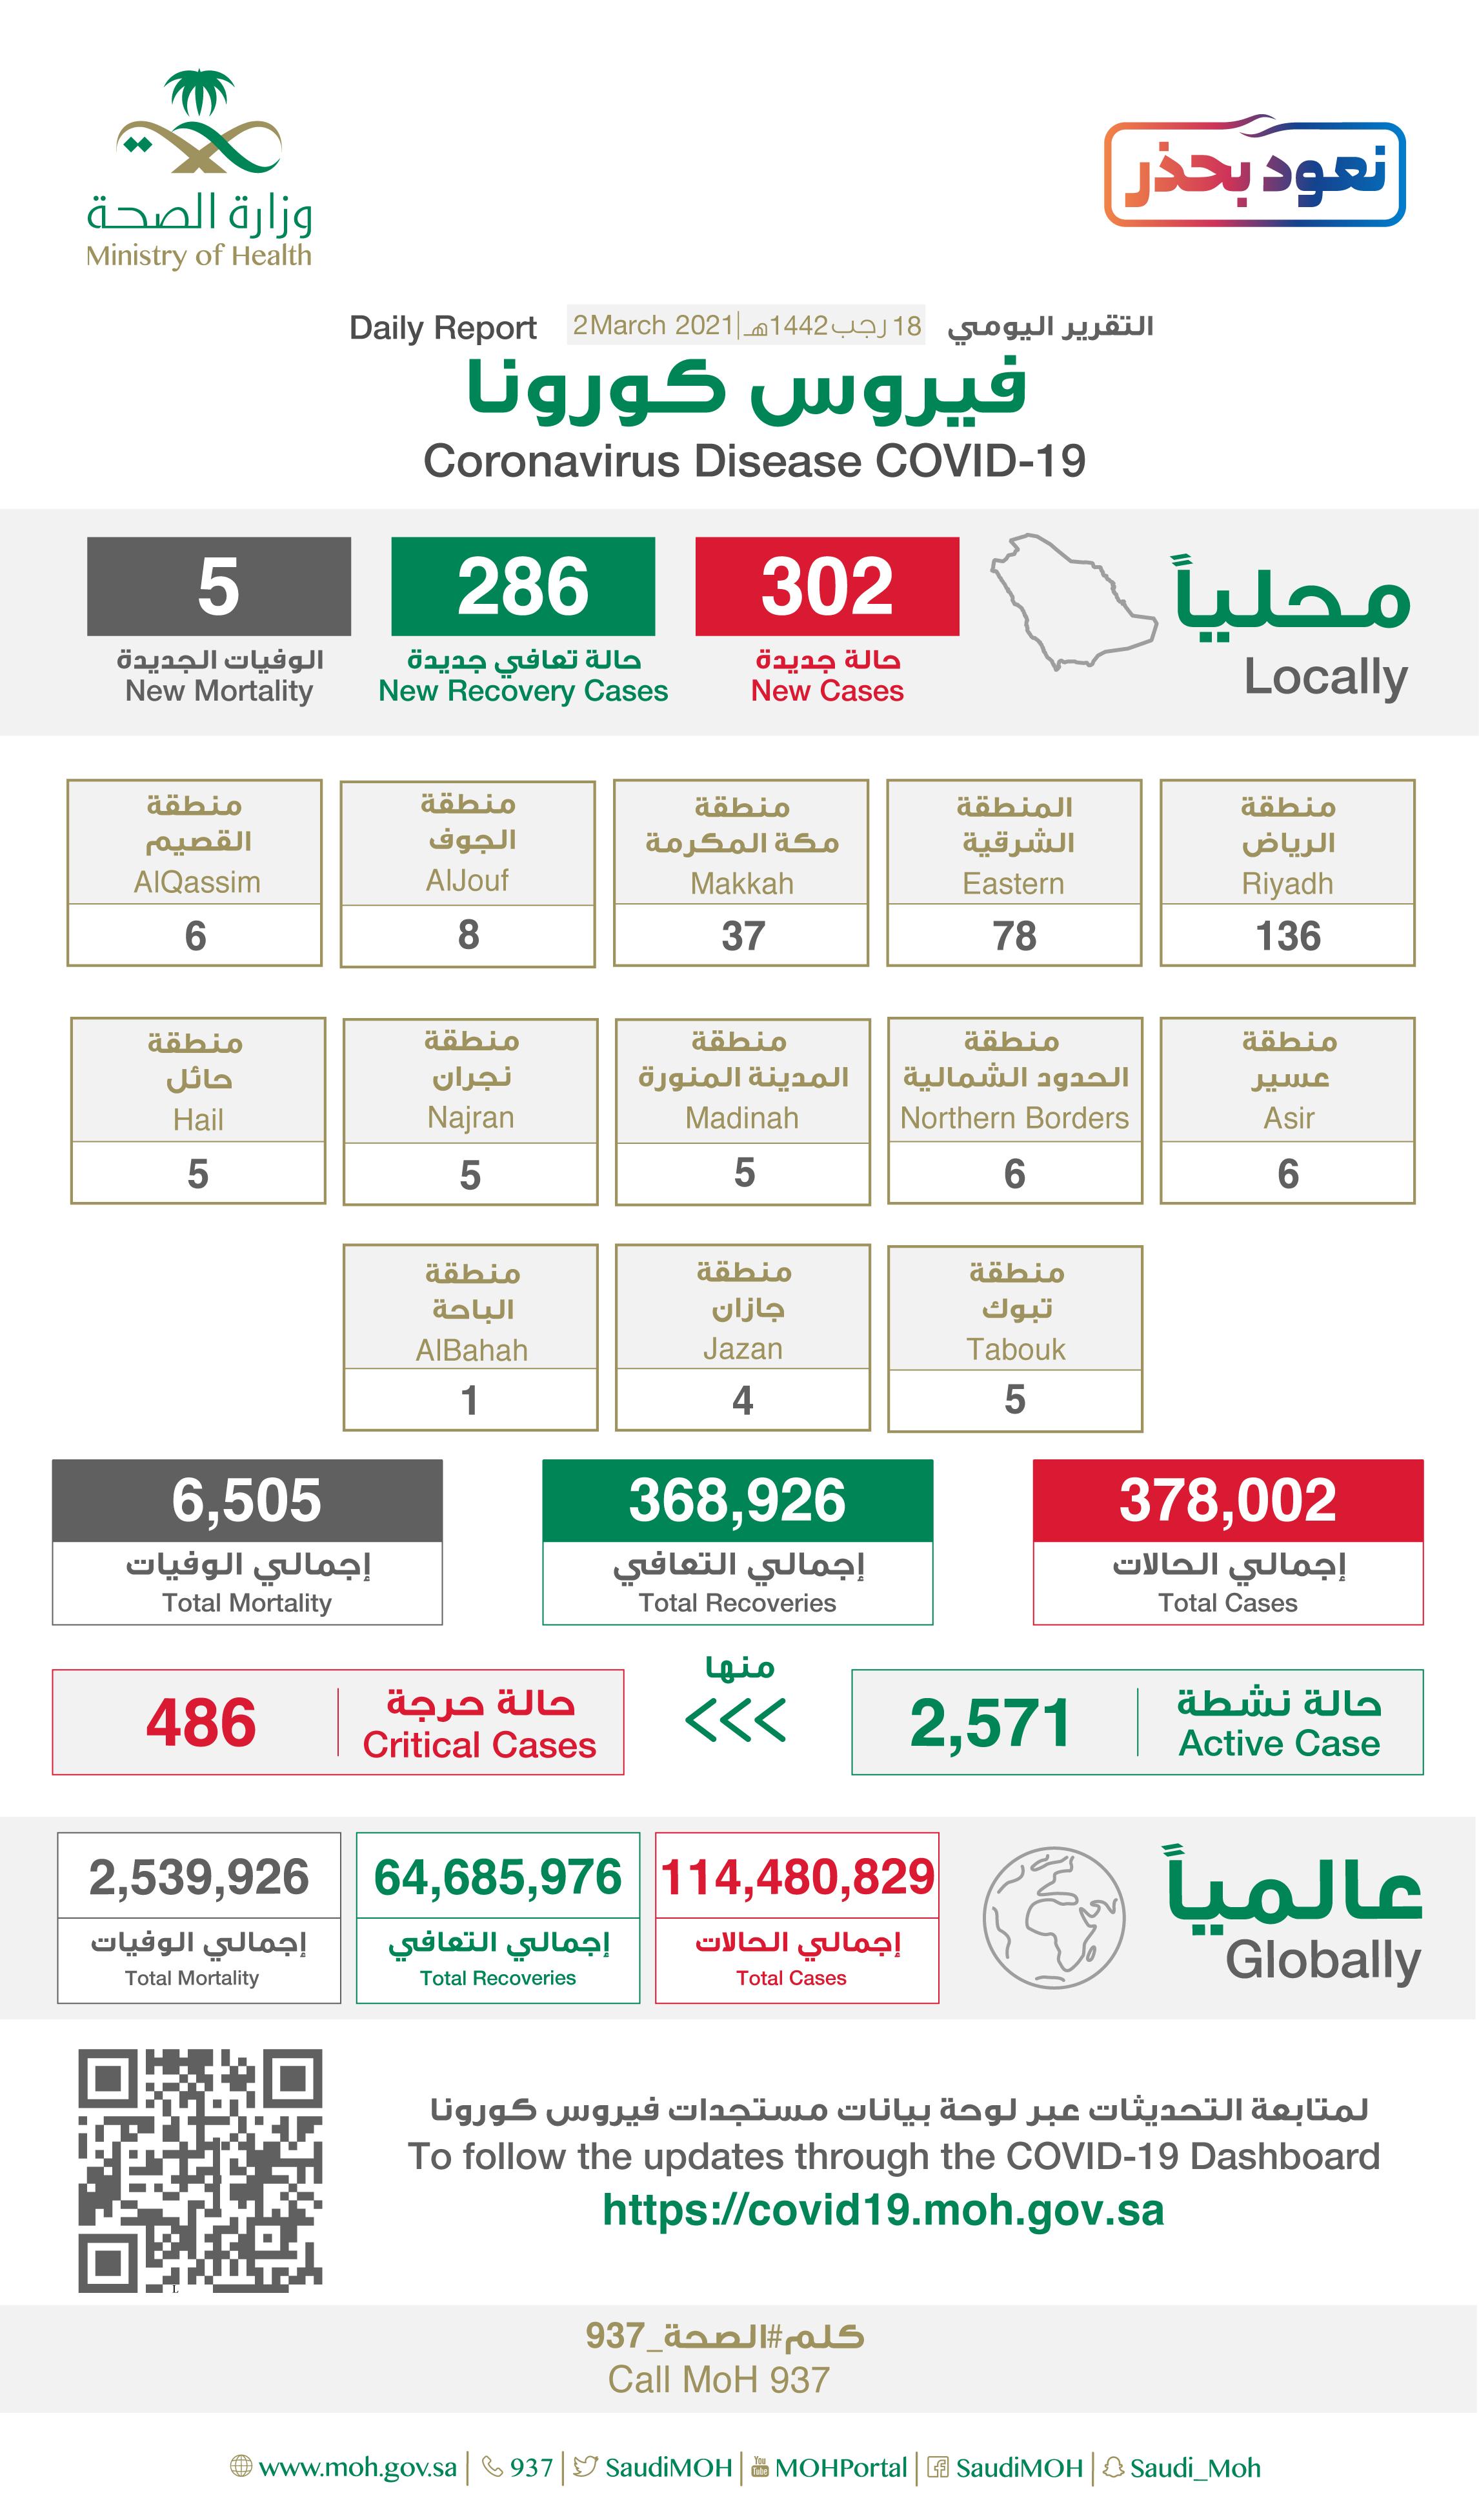 Saudi Arabia Coronavirus : Total Cases :378,002 , New Cases : 302, Cured : 368,926 , Deaths: 6,505, Active Cases : 2,571